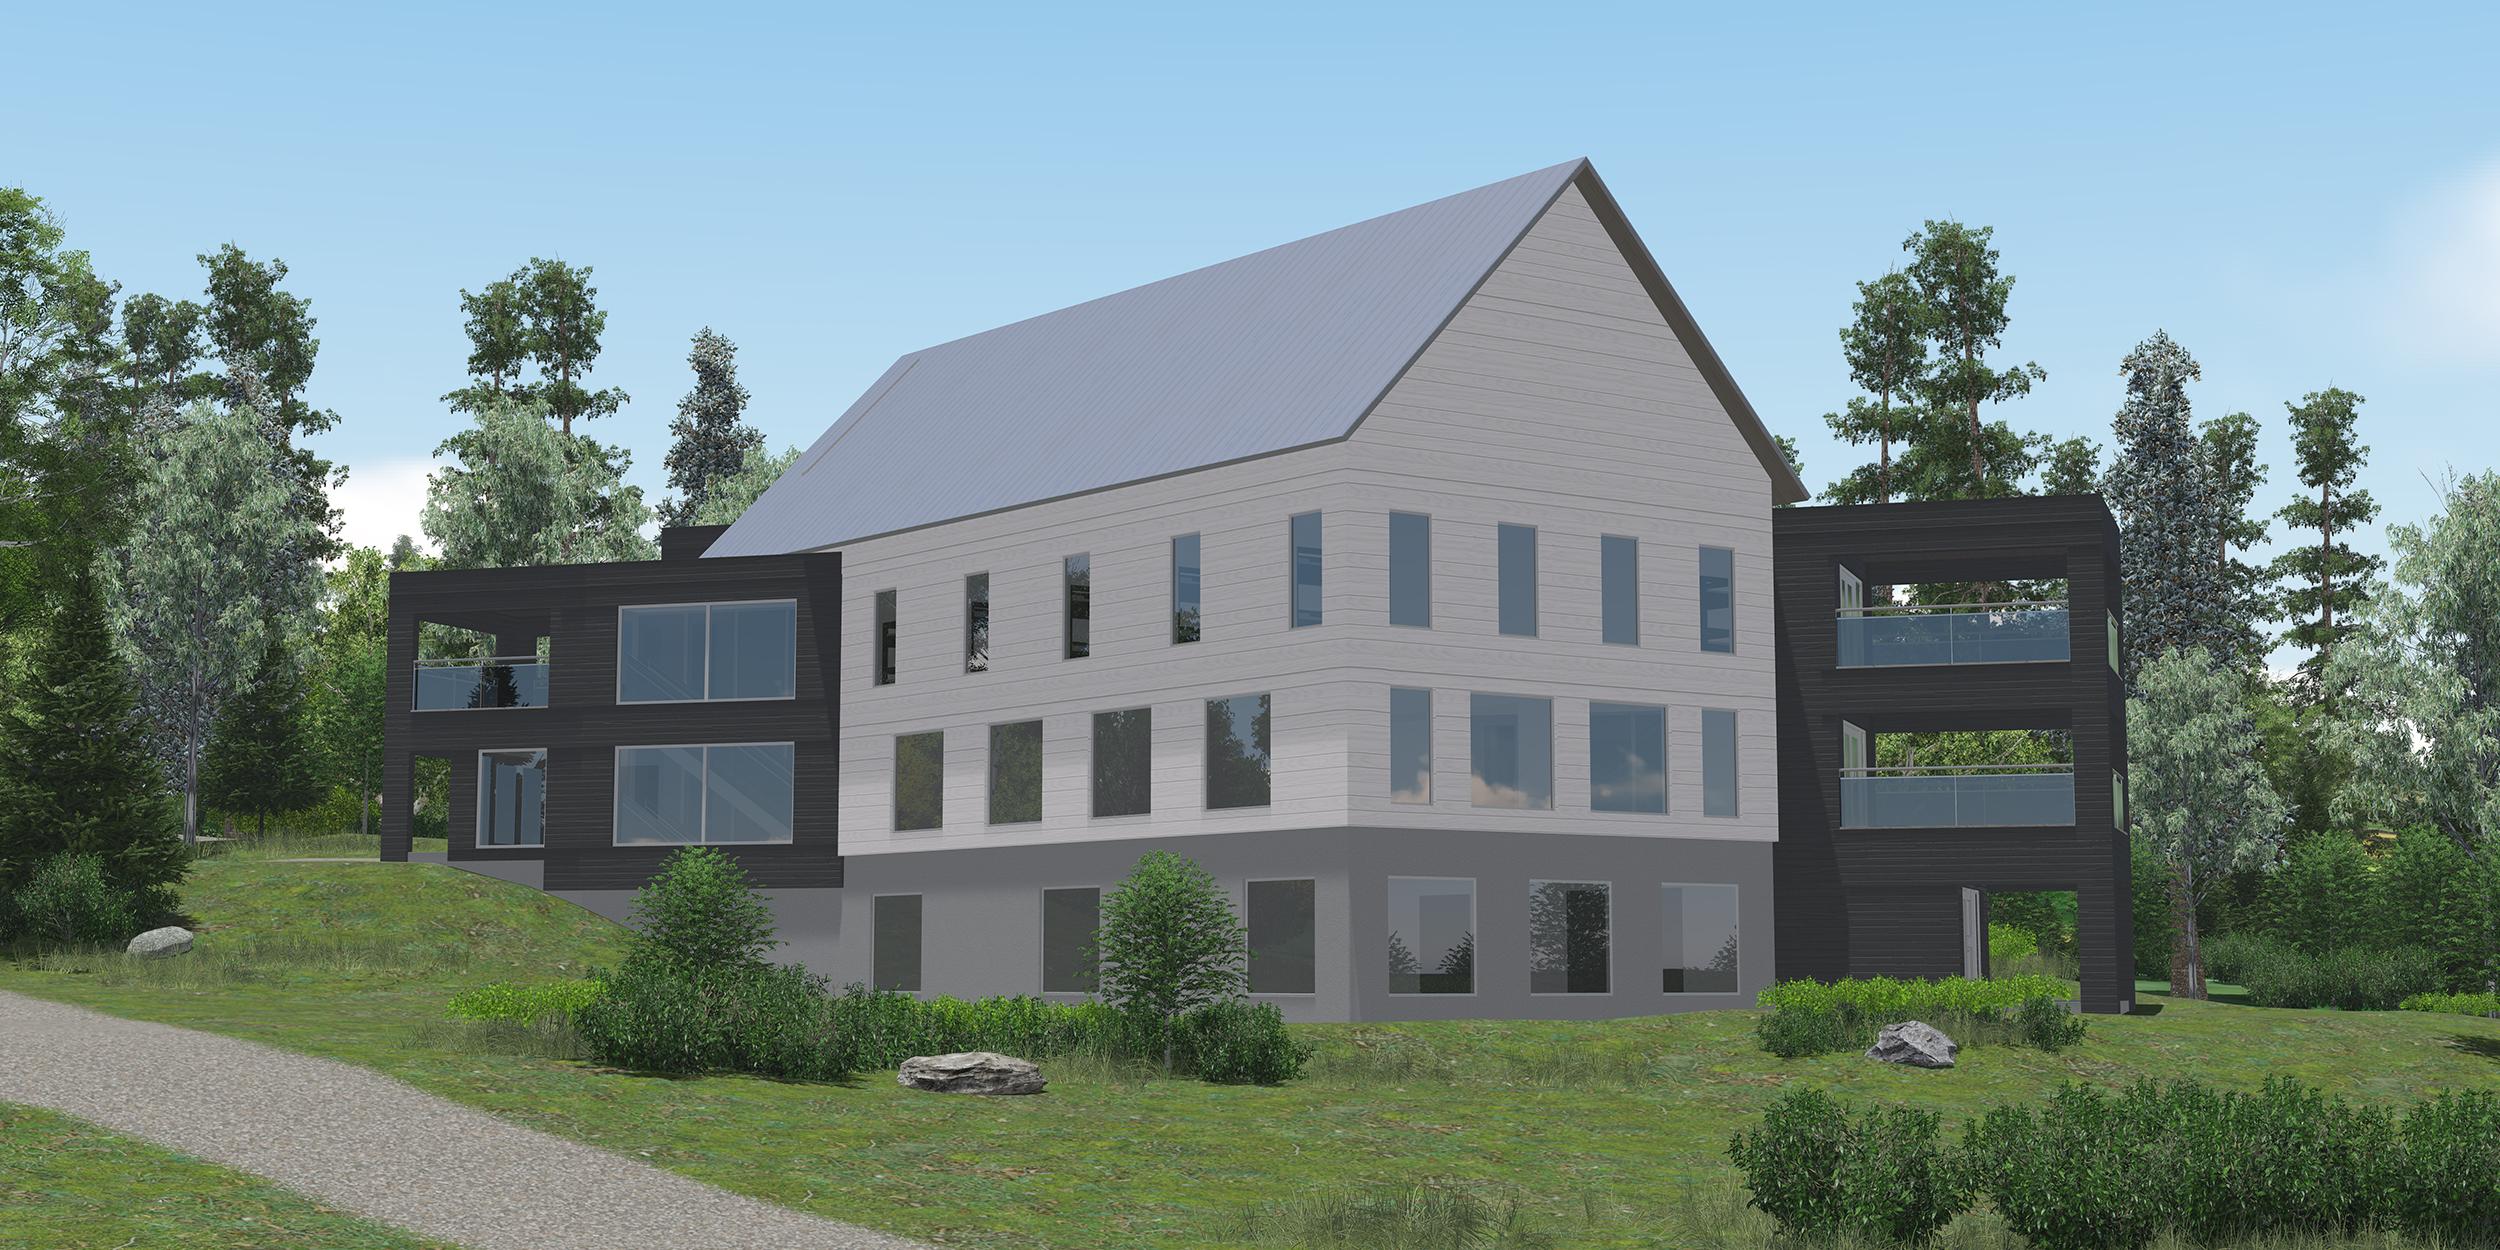 Kimbercote Accommodations Building - 002 - cropped.jpg